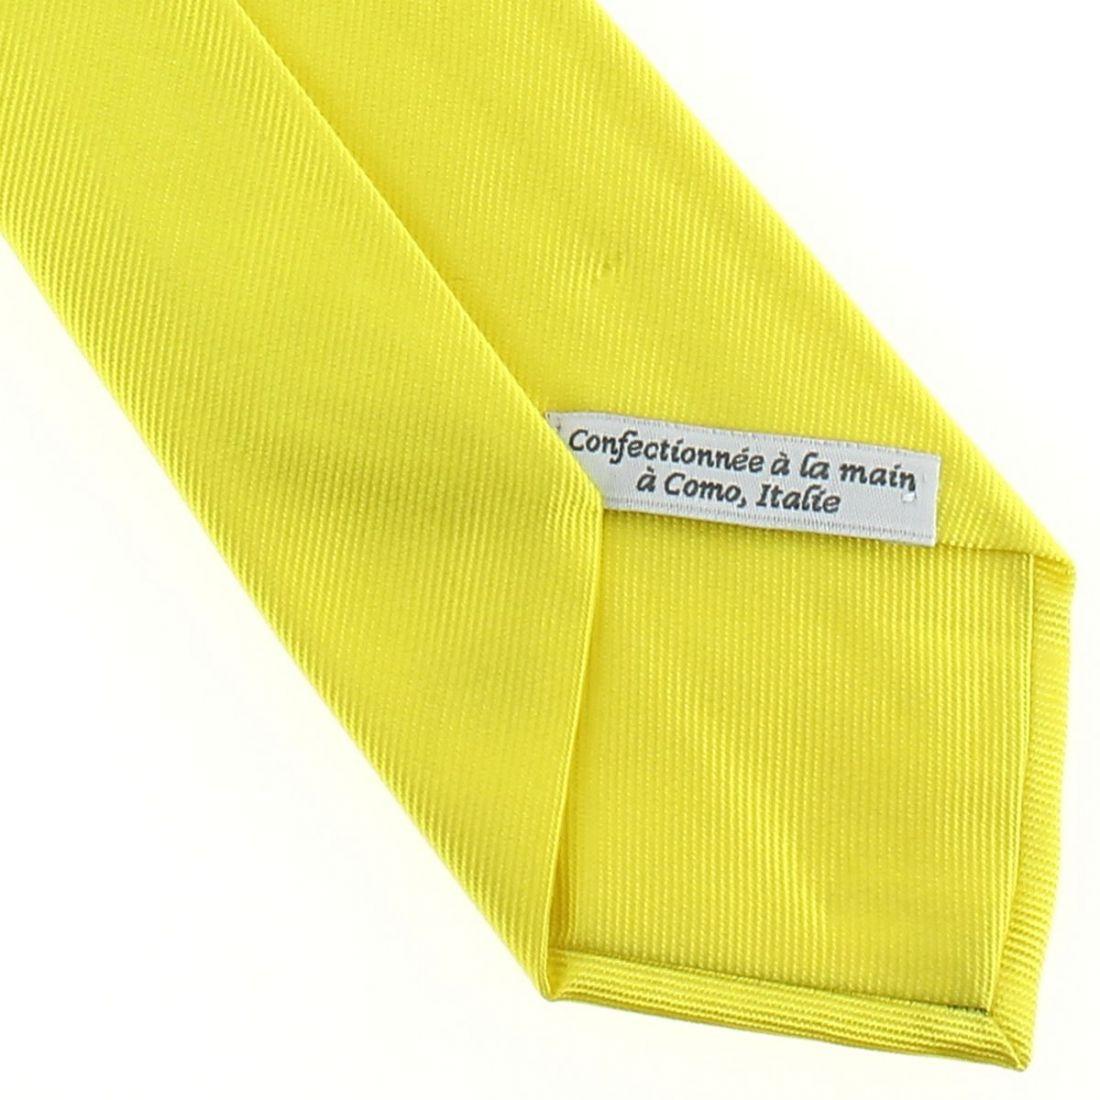 cravate luxe faite la main jaune citron cravate. Black Bedroom Furniture Sets. Home Design Ideas